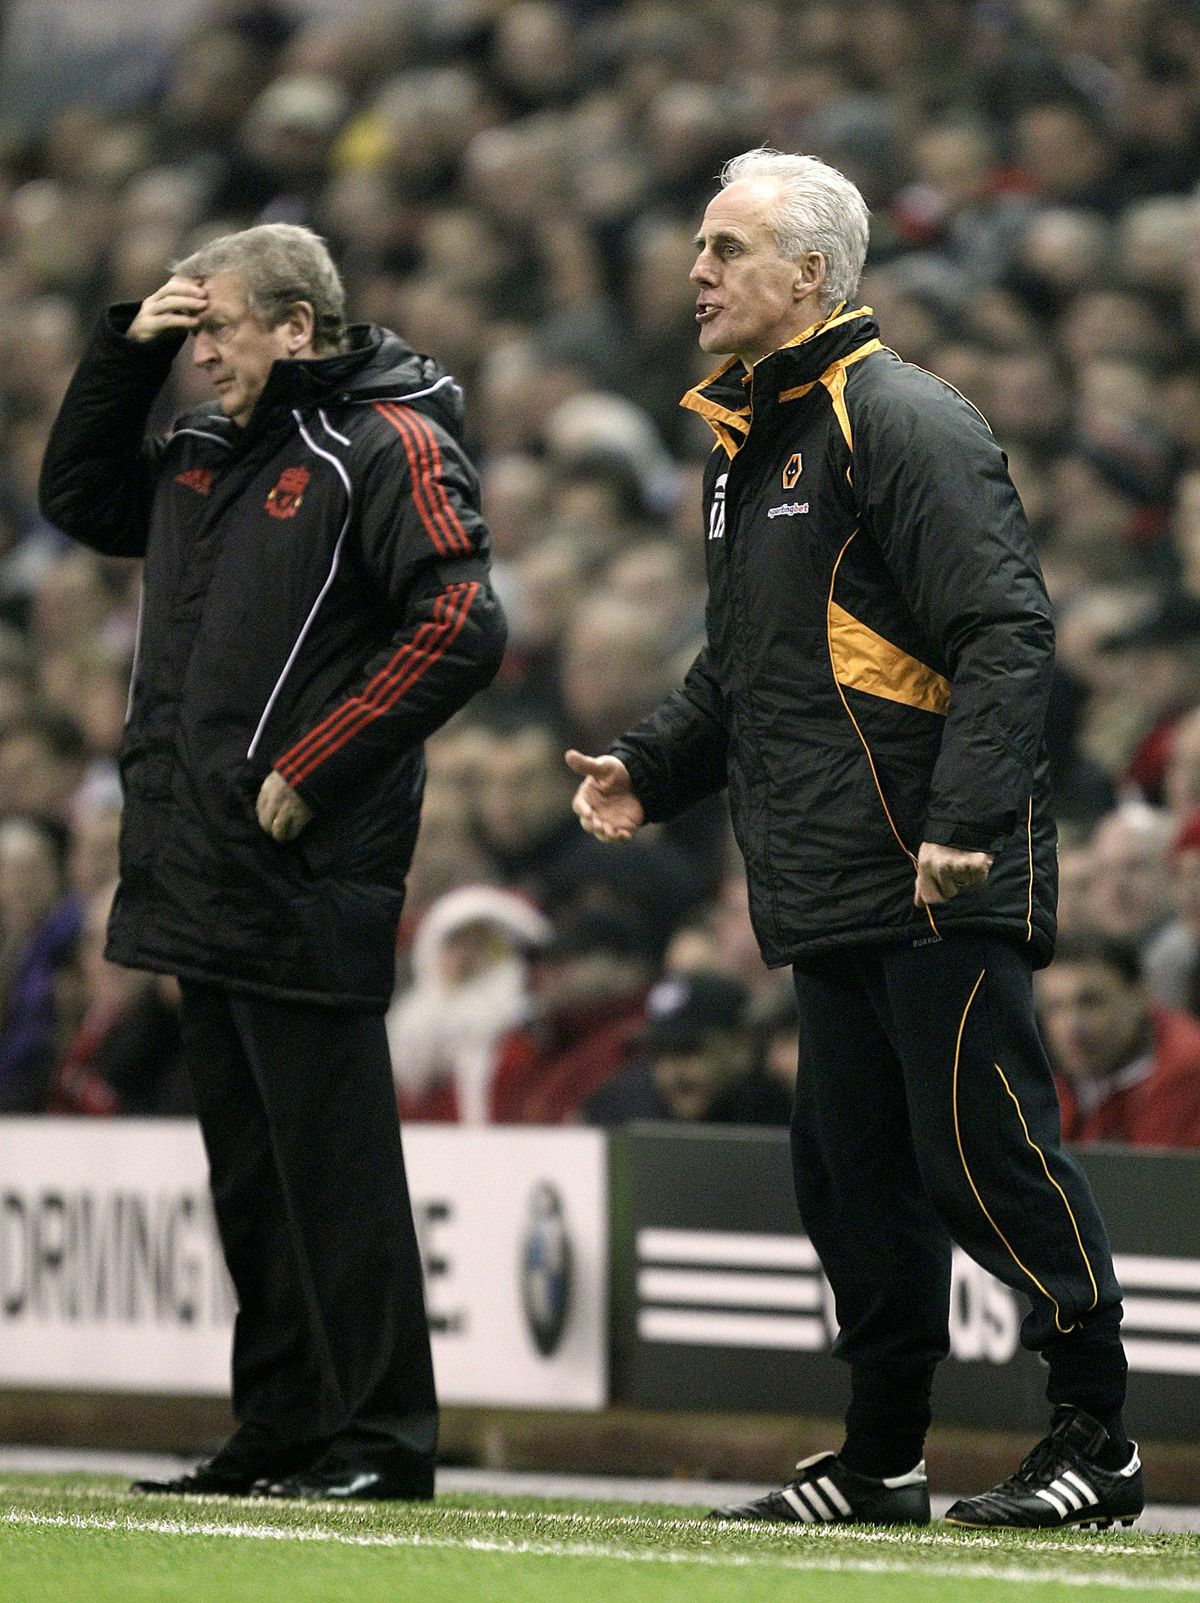 Wolverhampton Wanderers' manager Mick McCarthy